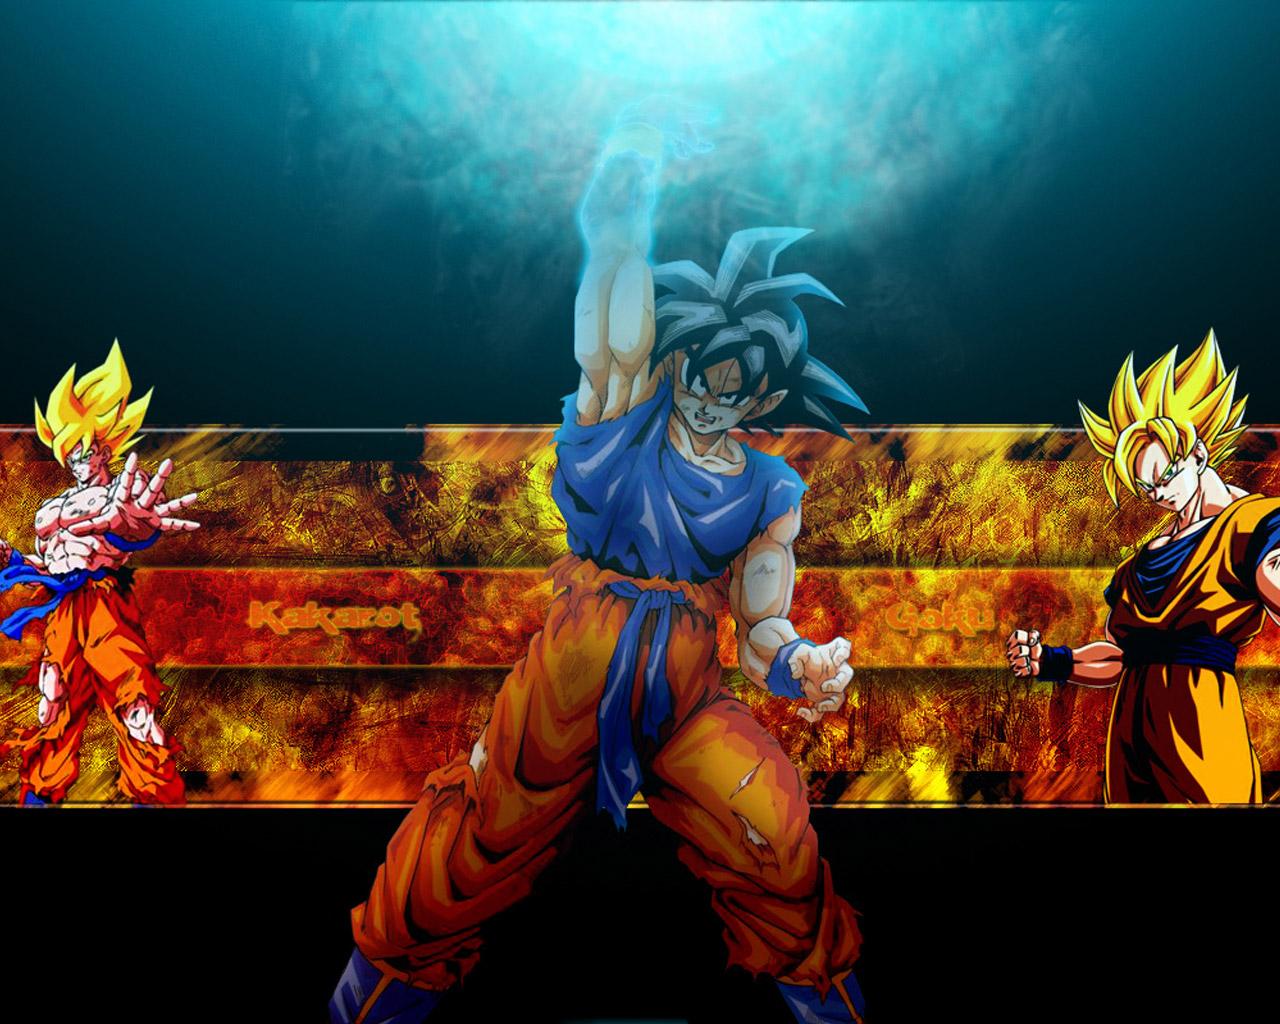 Download the Dragonball anime wallpaper titled Goku 1280x1024